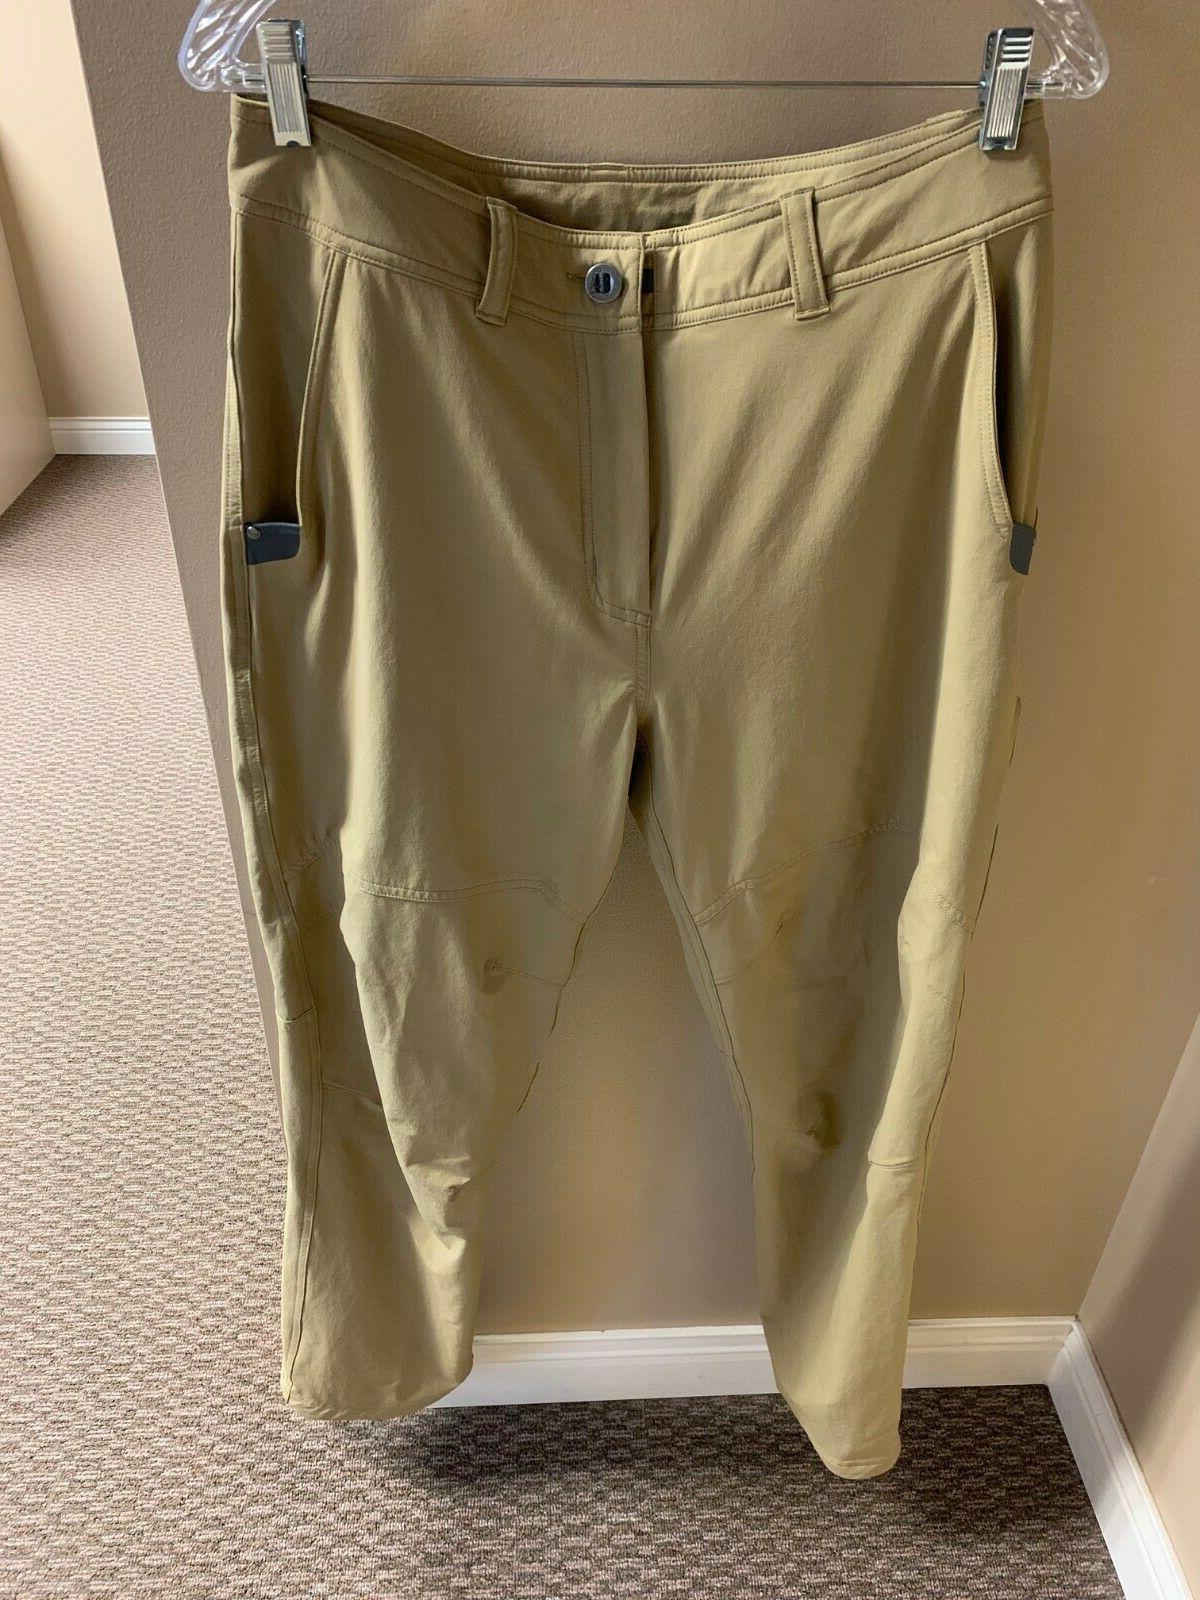 Sitka Gear Men's 34R, color brand